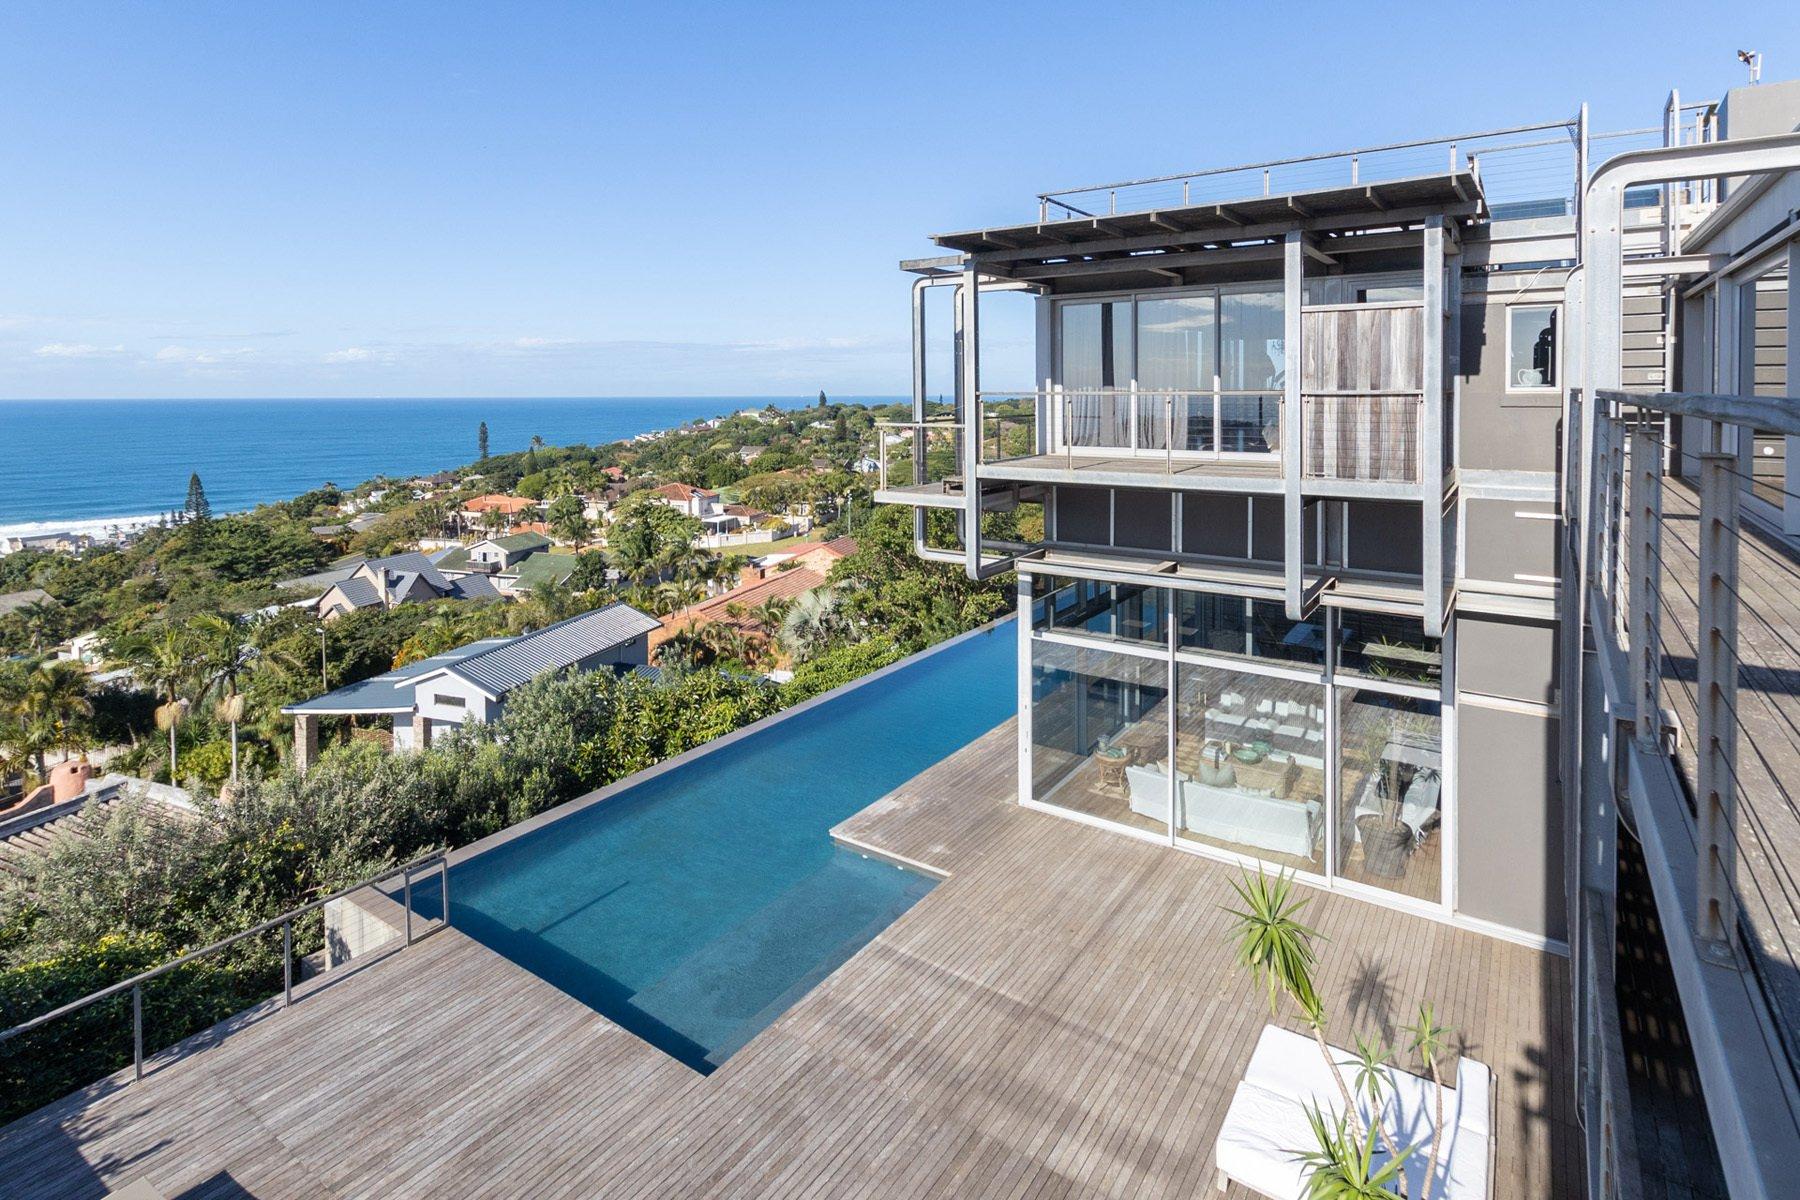 House in Dolphin Coast, KwaZulu-Natal, South Africa 1 - 11502311